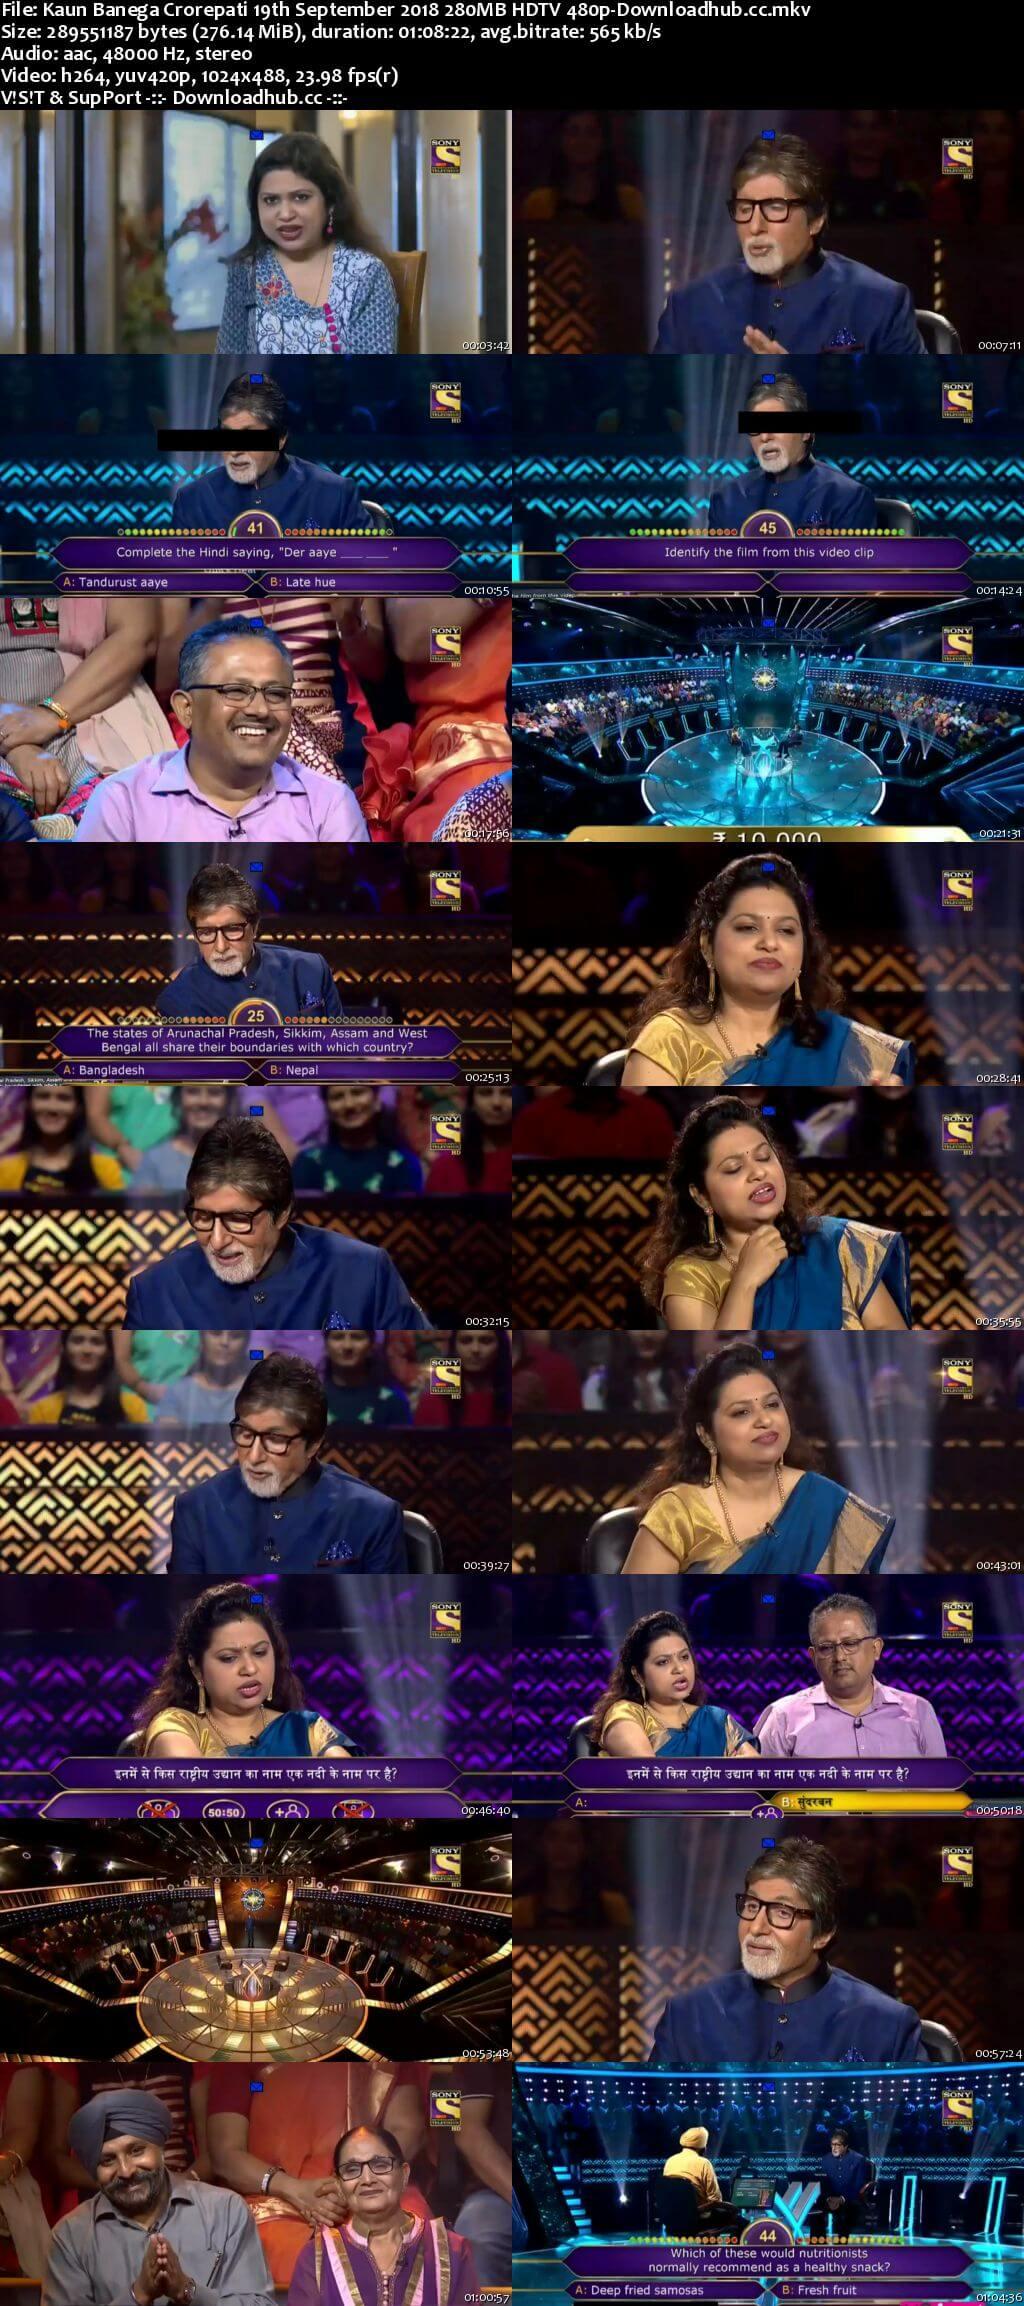 Kaun Banega Crorepati 19th September 2018 280MB HDTV 480p